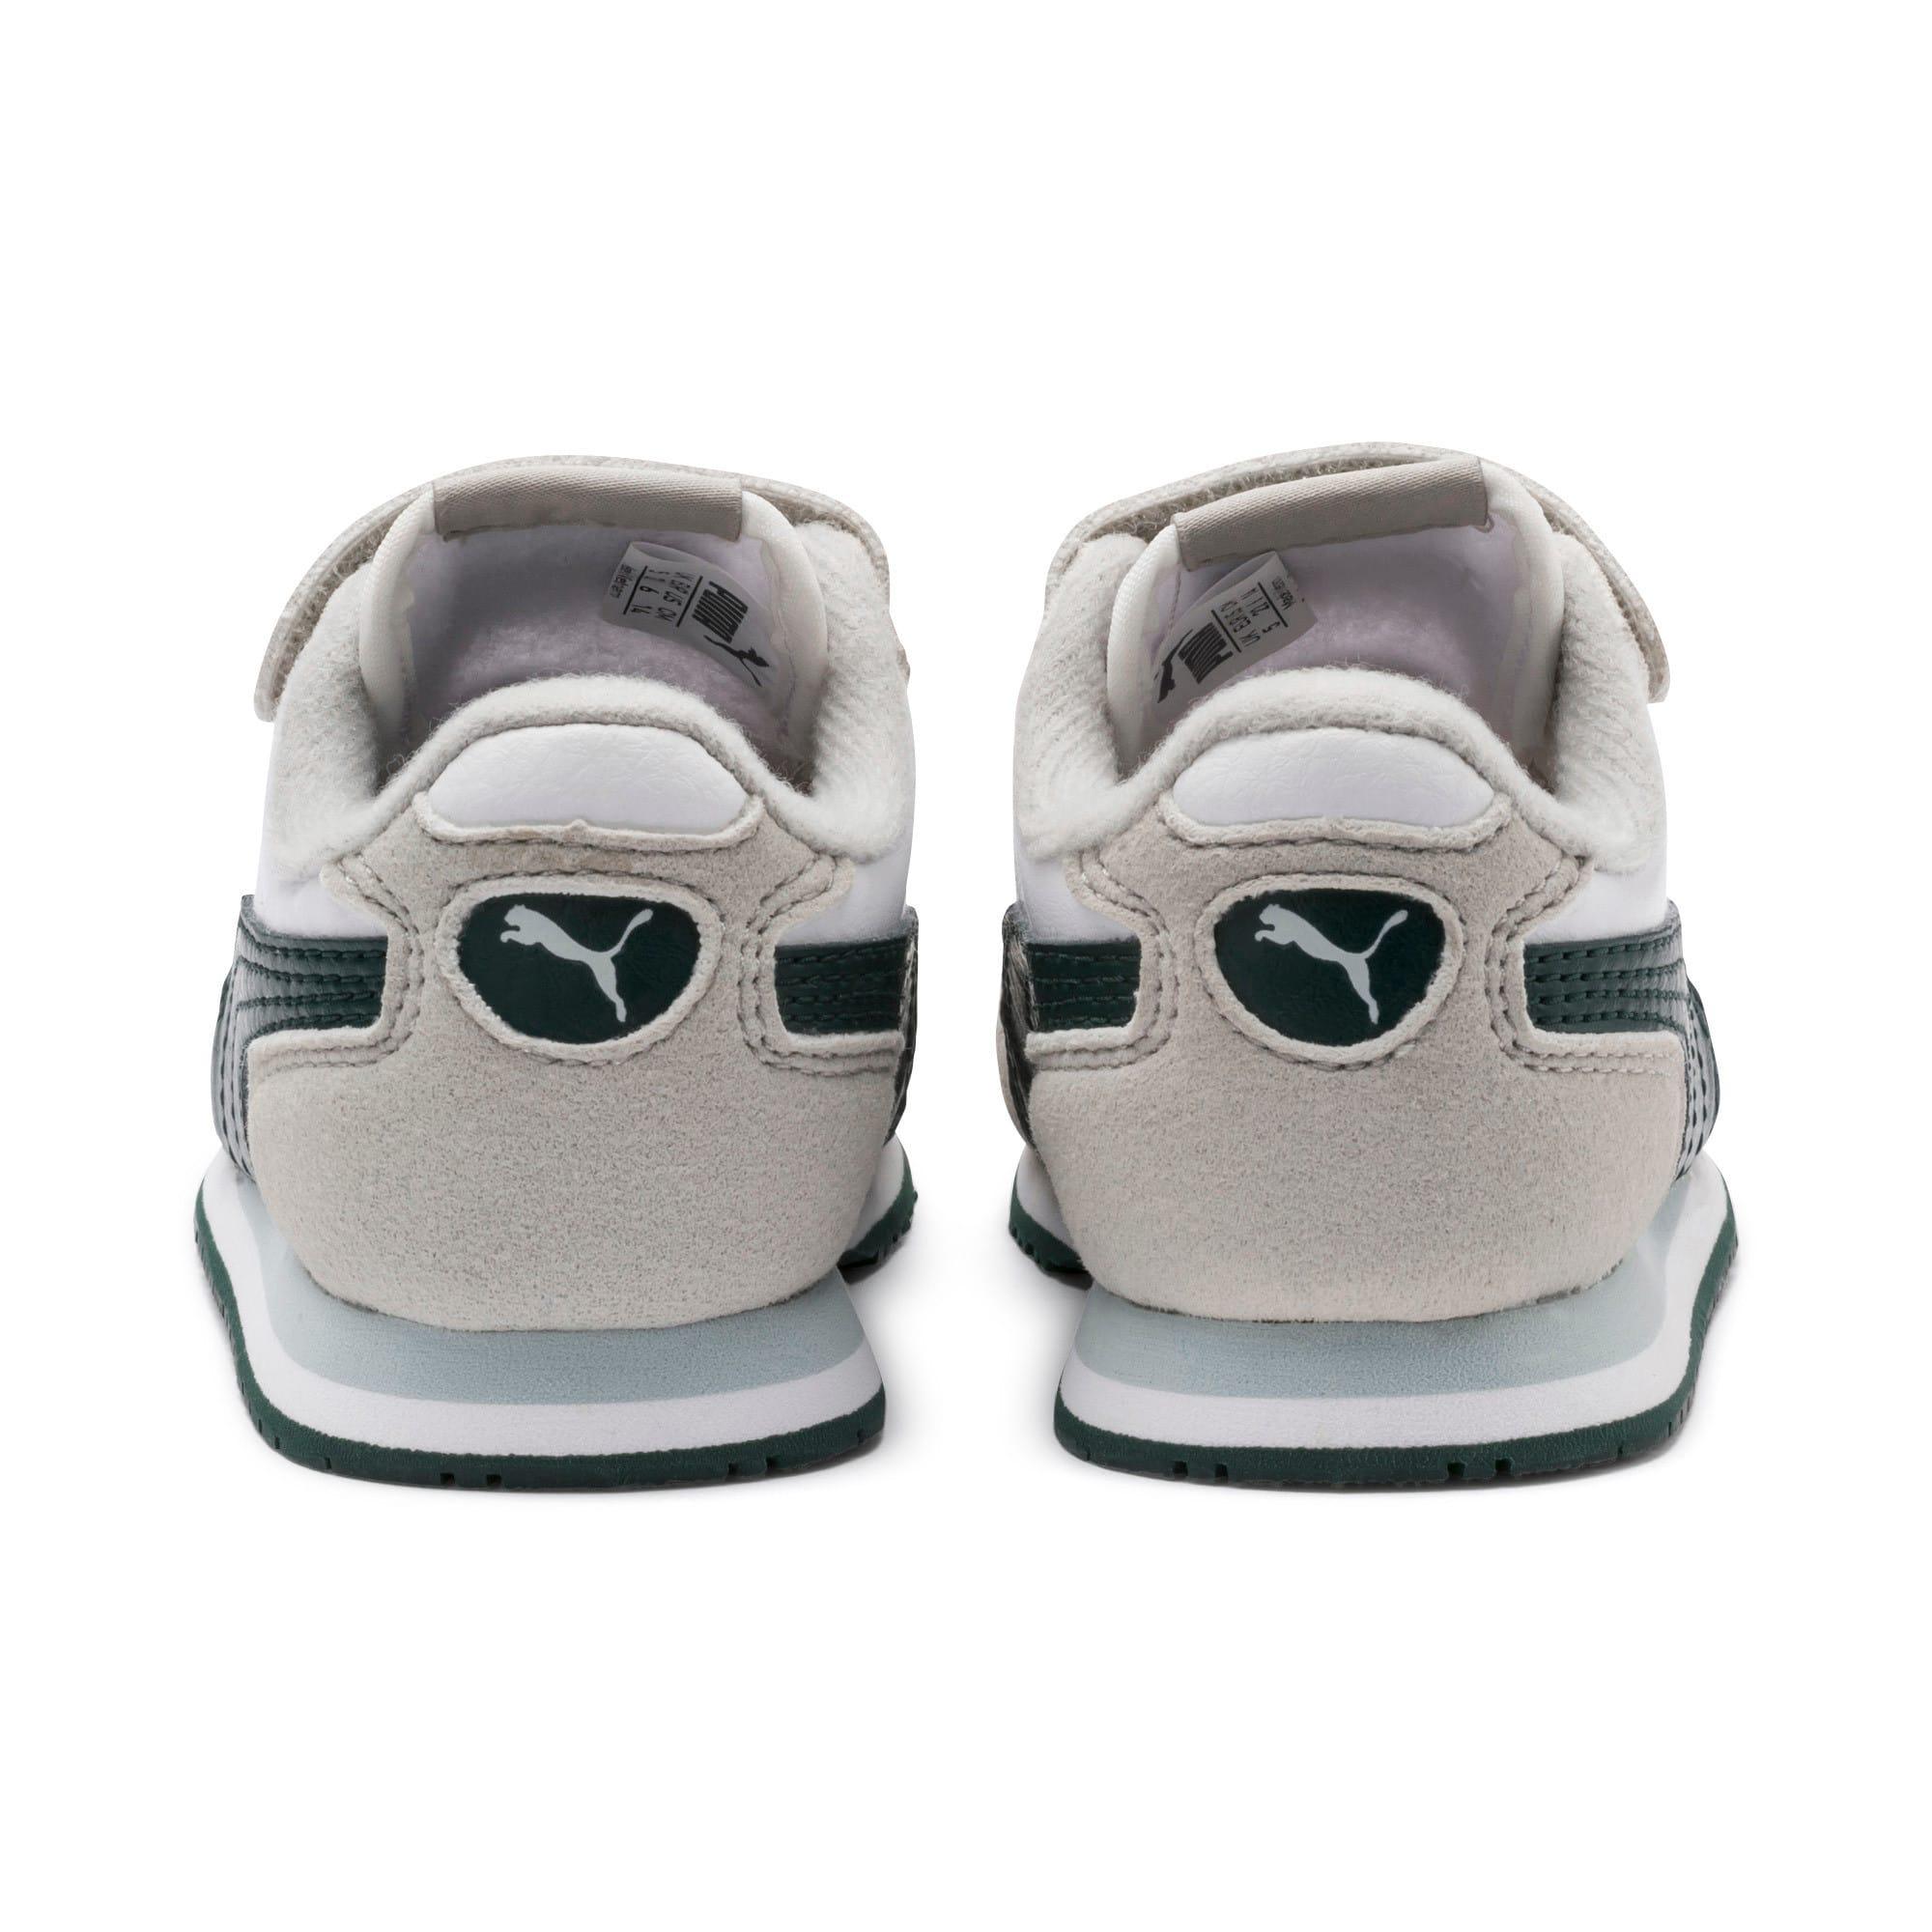 Thumbnail 4 of Cabana Racer SL AC Little Kids' Shoes, P.Wht-Gr.Violet-Ponder. Pine, medium